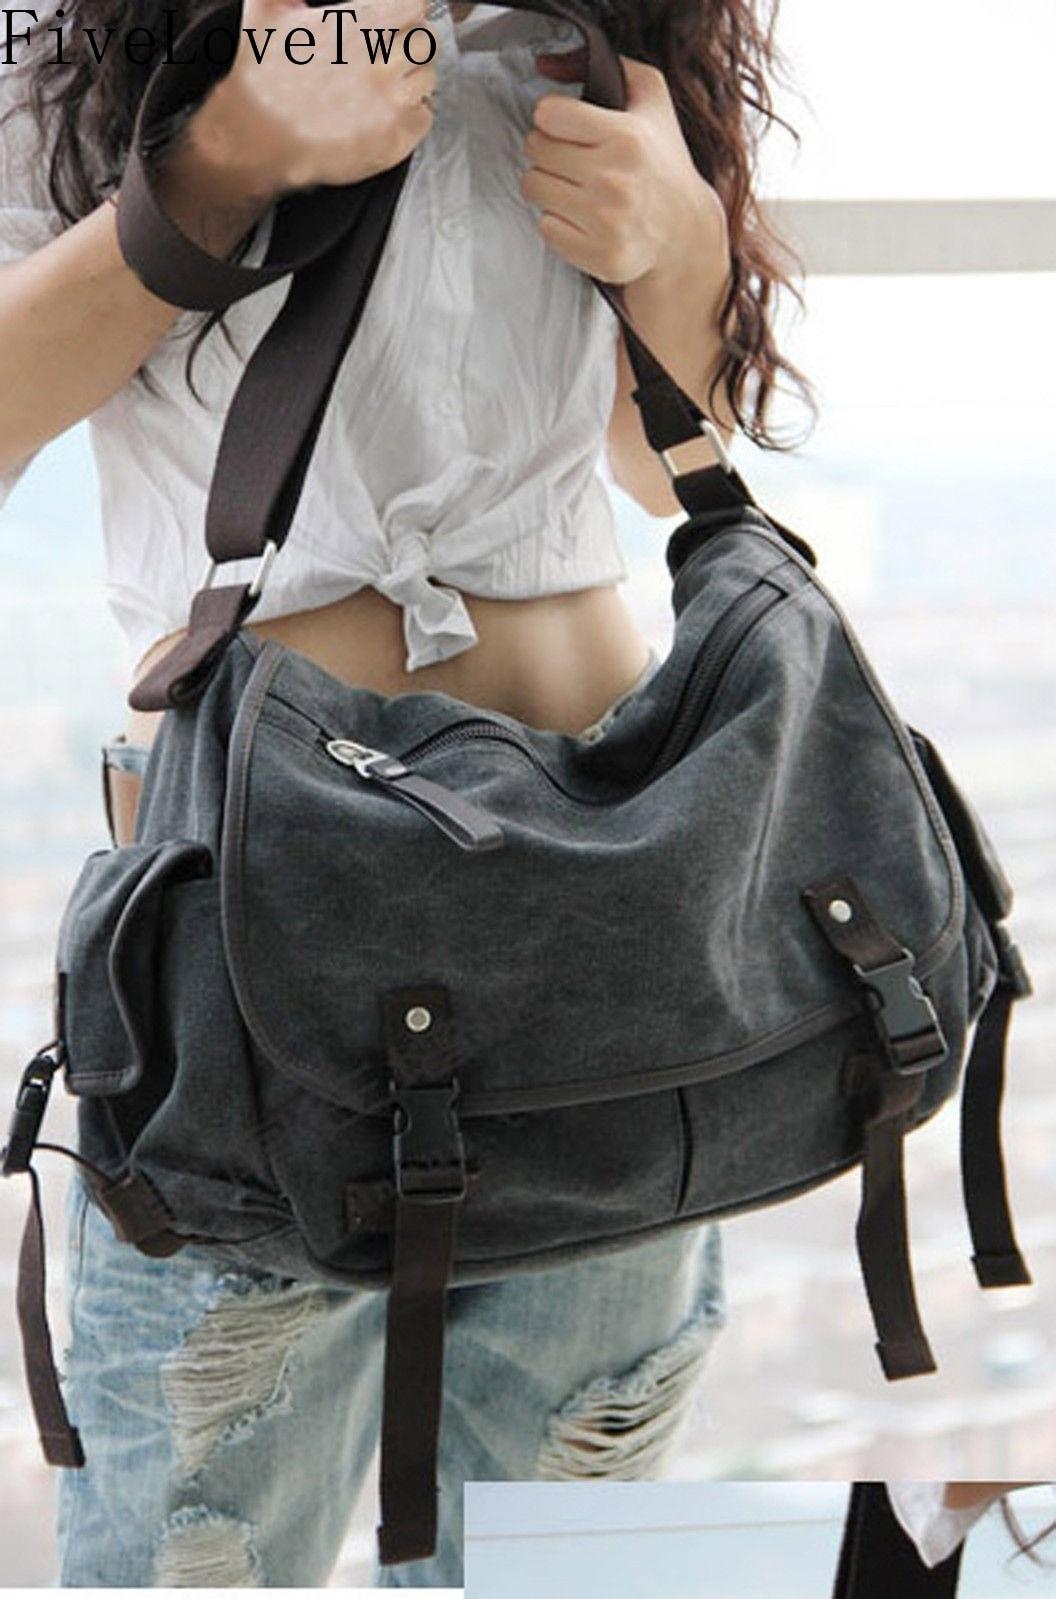 Fivelovetwo grande bolsa de lona do vintage mensageiro totebag livro portátil ombro escola ladys bolsa masculina saco